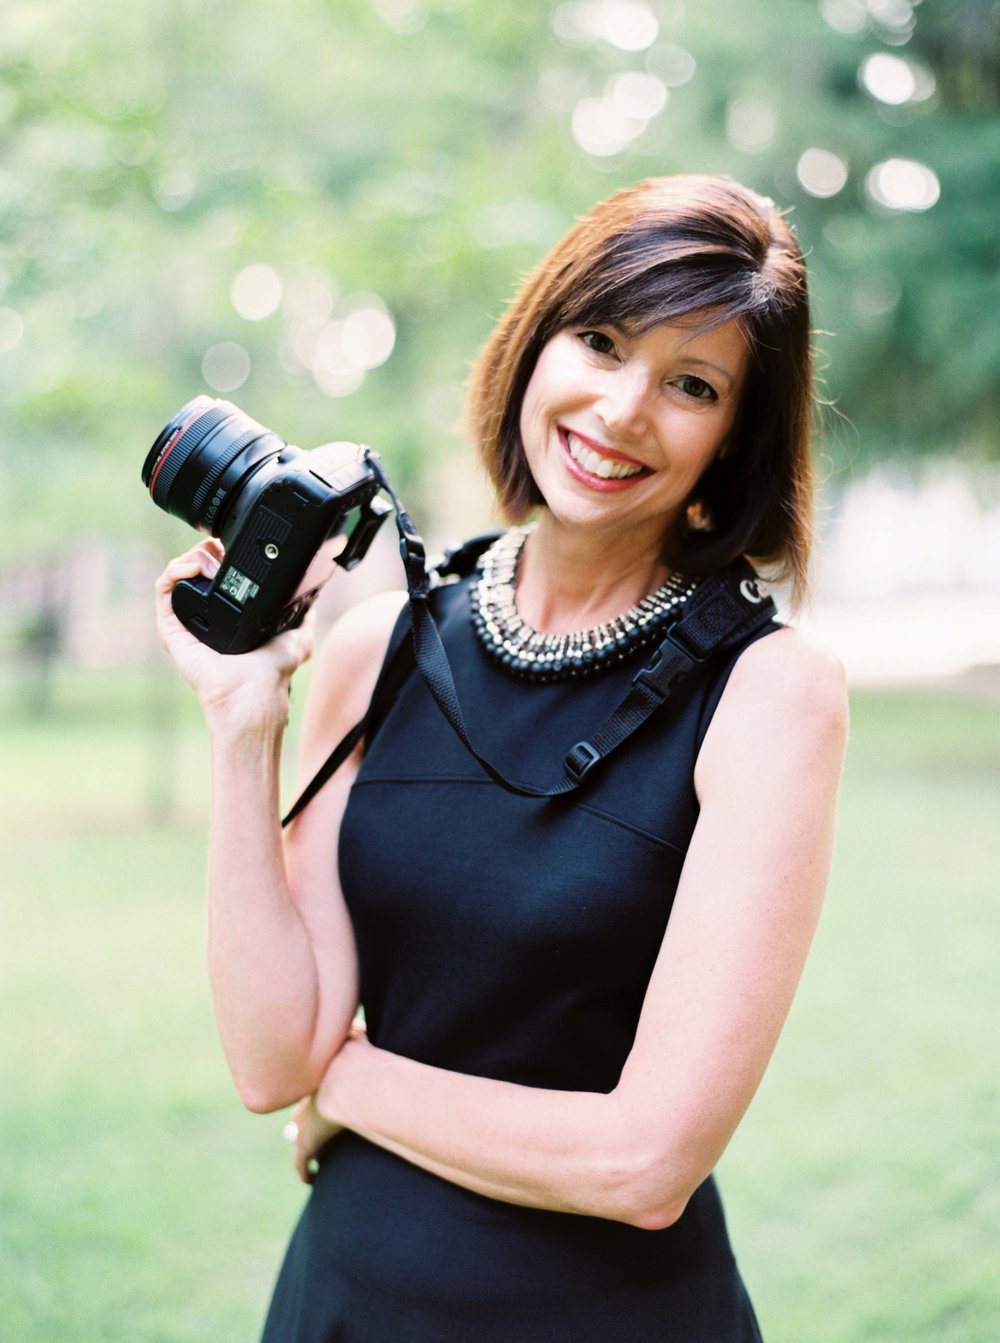 Esther_Headshots_Kati_Rosado-1 copy_pp.JPG